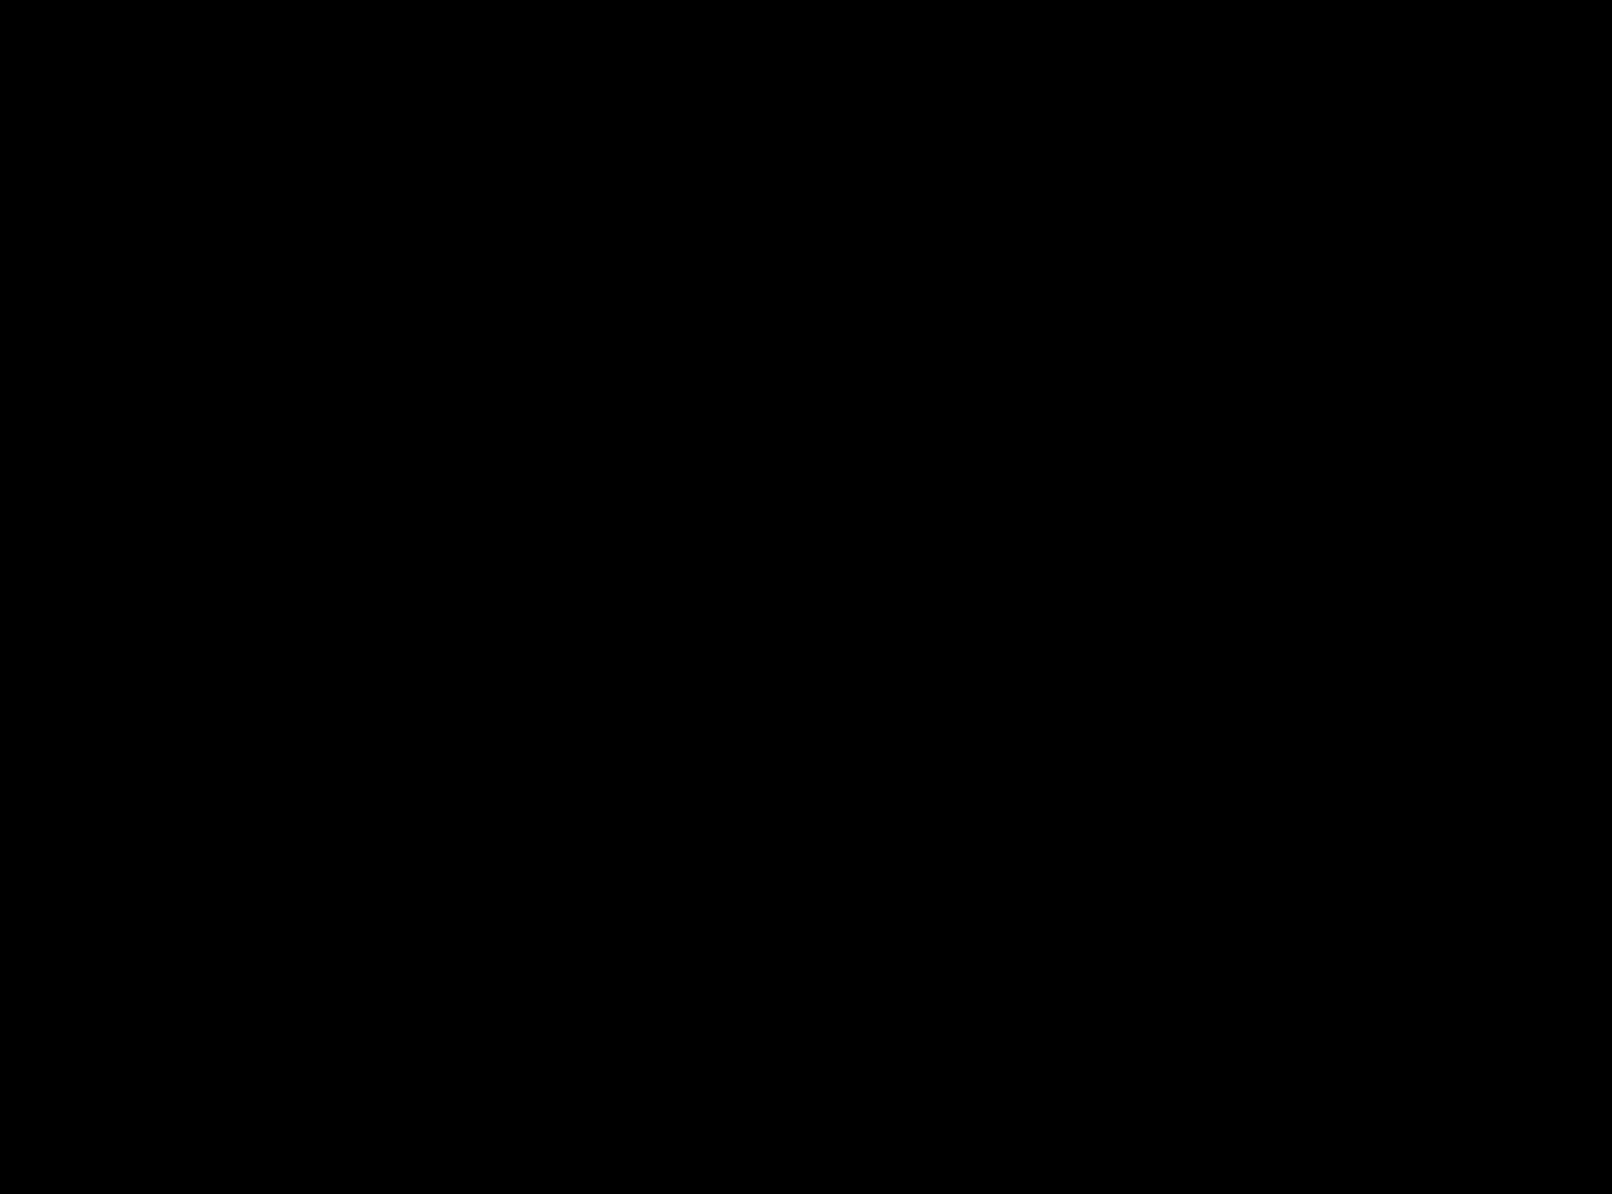 black gradient_.png